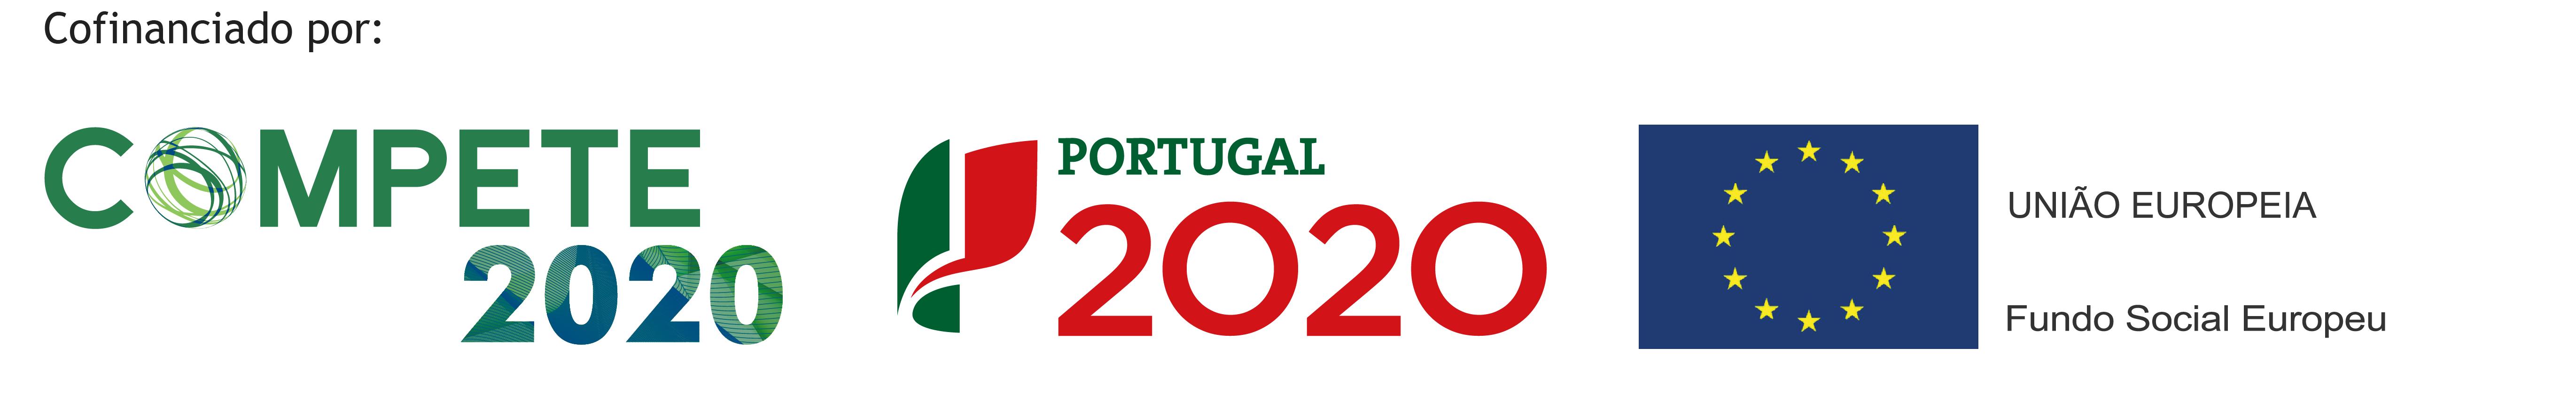 hospital-de-braga-2020